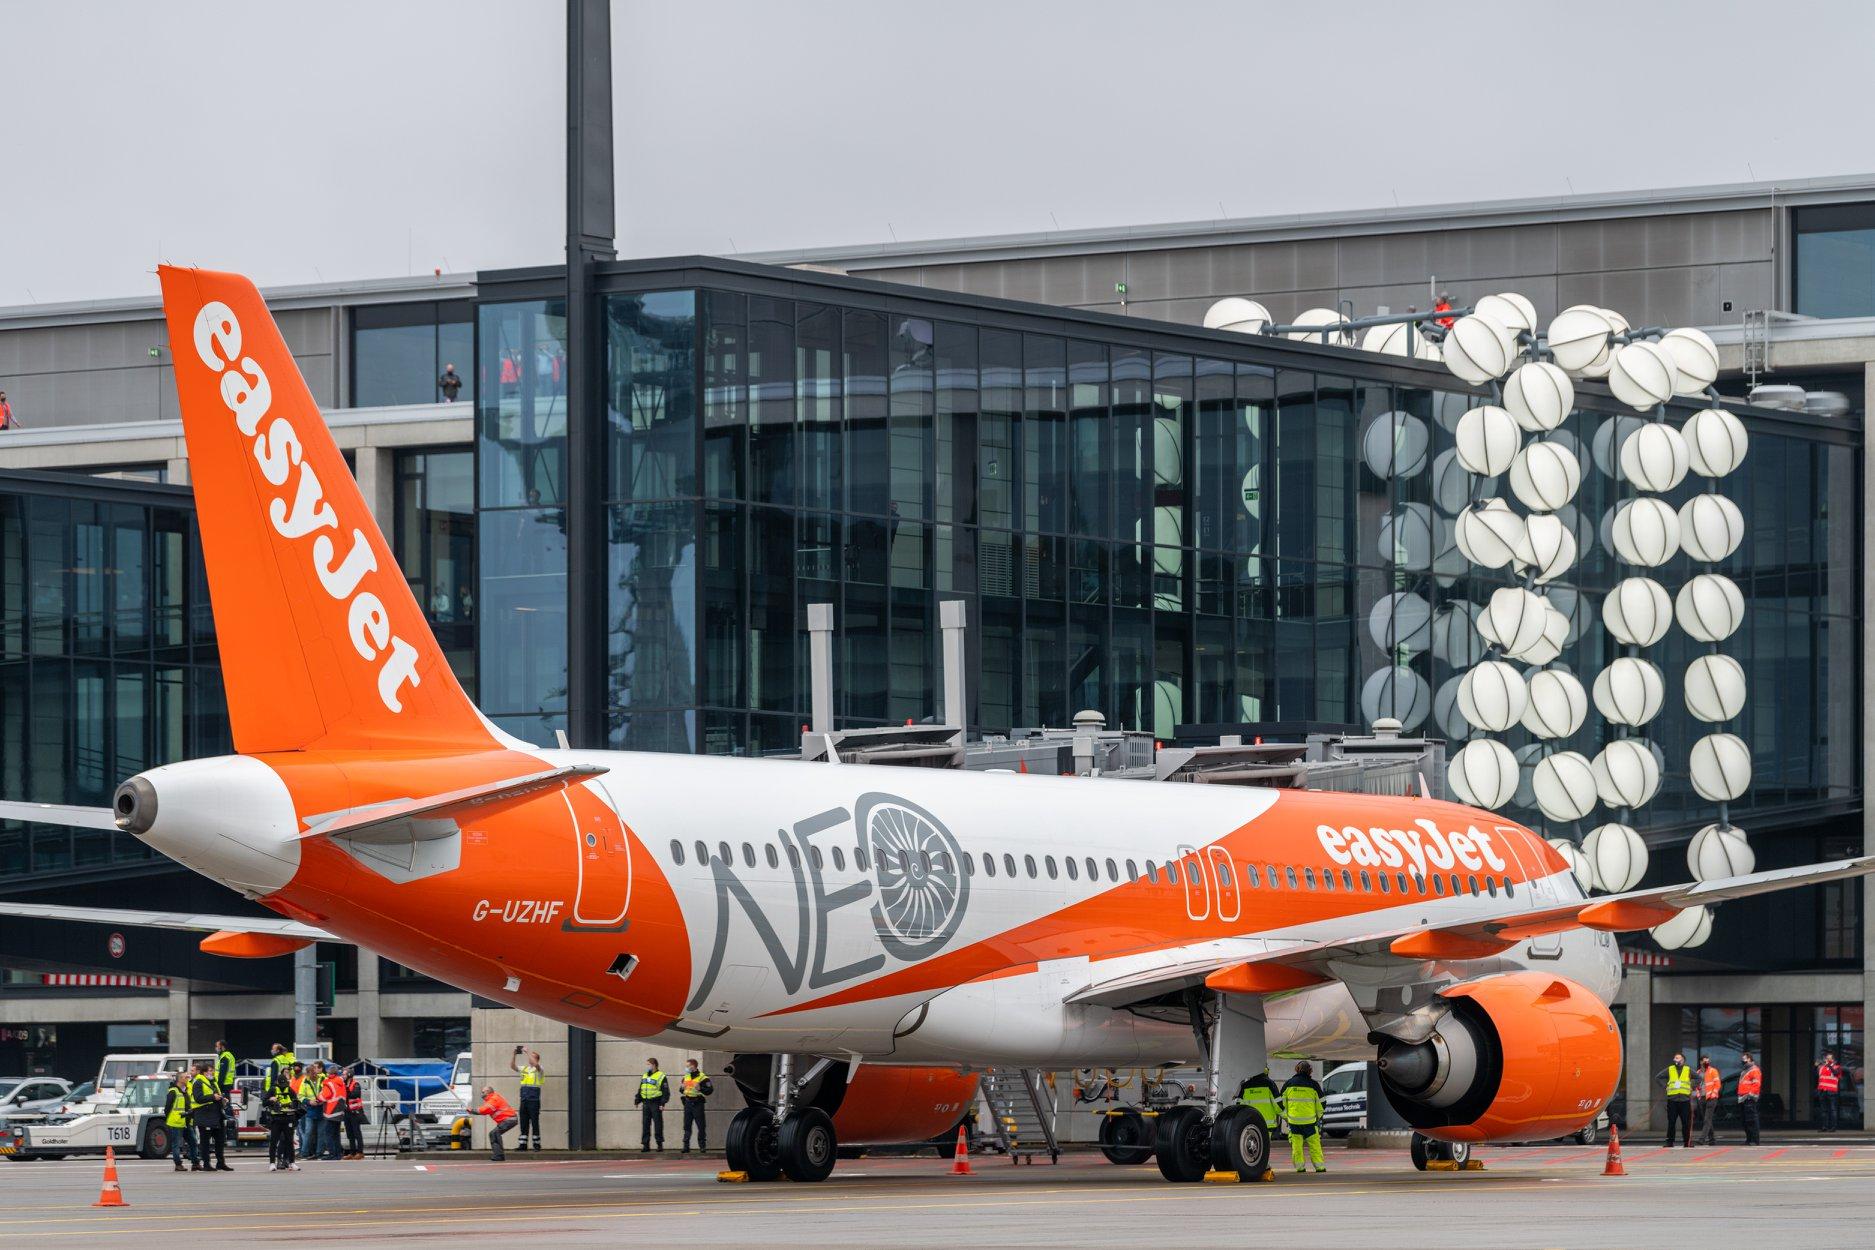 Airbus A320neo fra easyJet ved åbningen af Berlin Brandenburg Airport. (Foto: Foto: Günter Wicker)